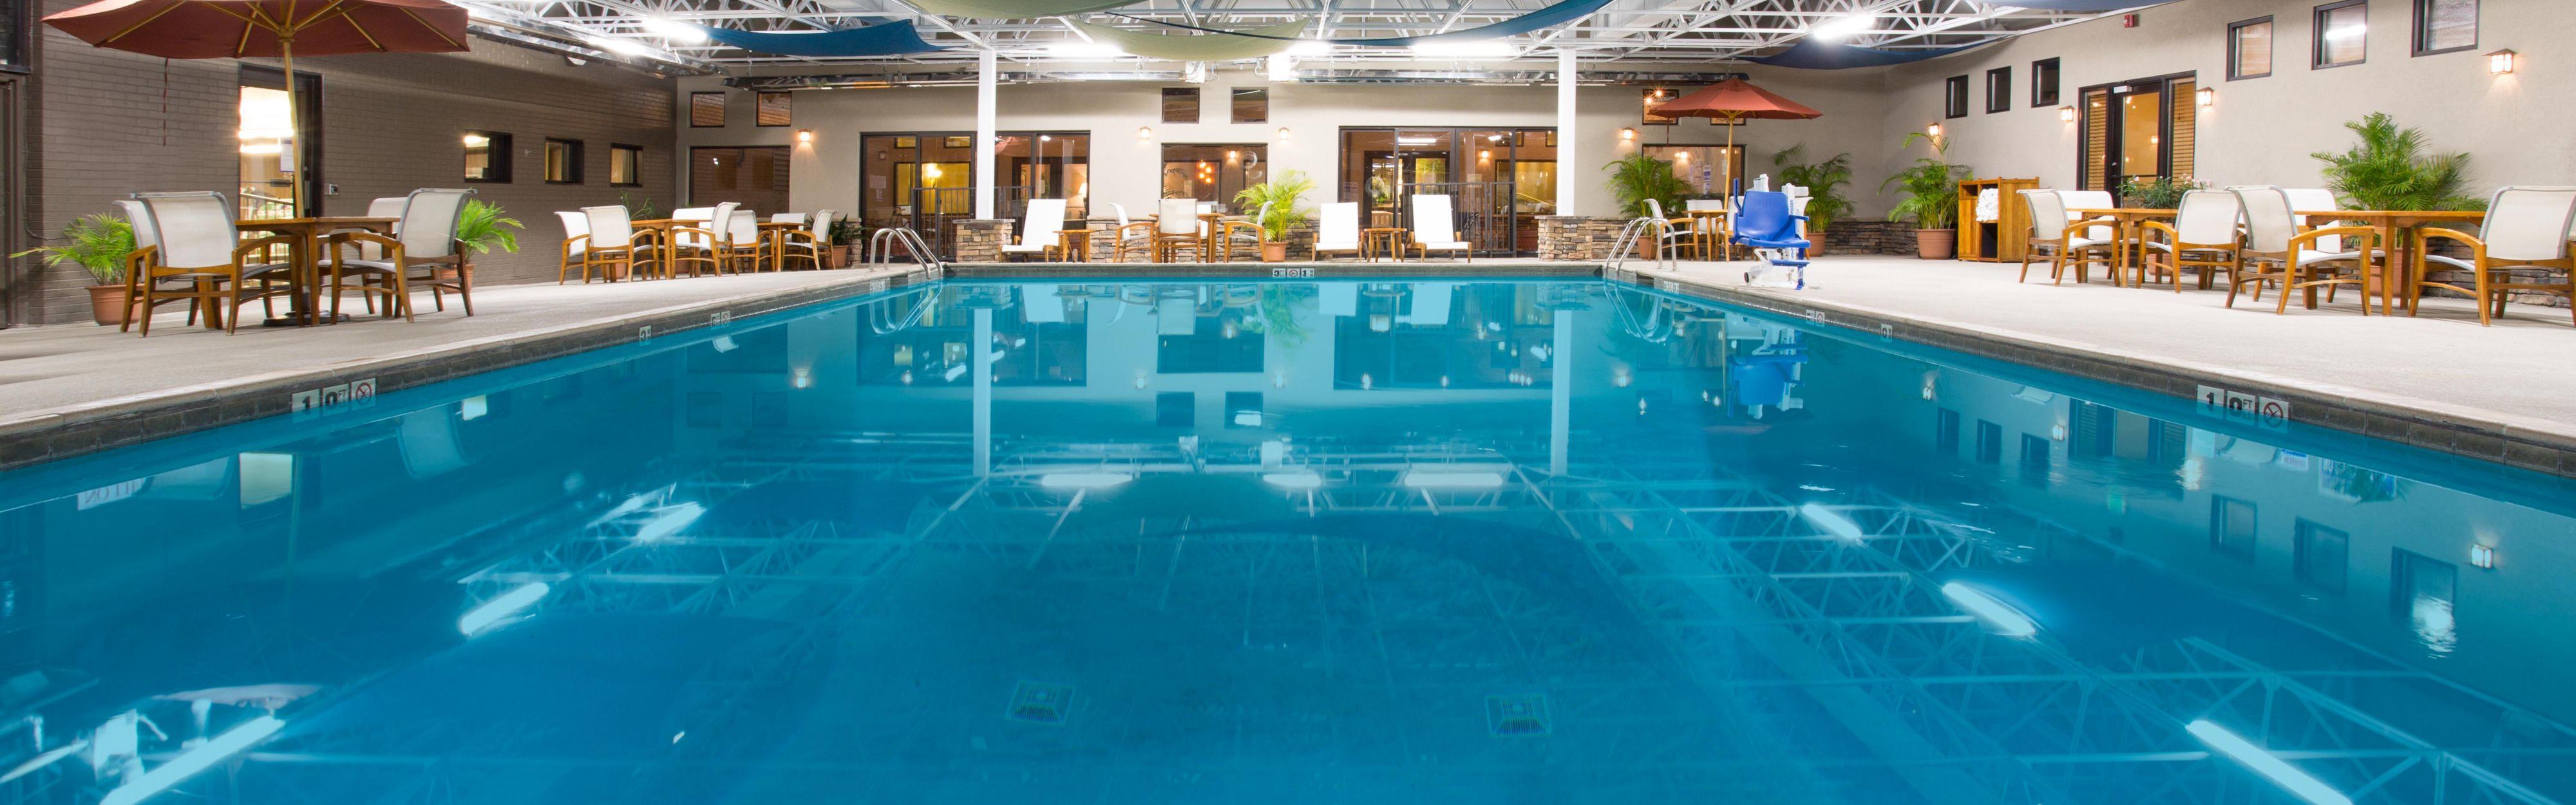 Holiday Inn Denver-Cherry Creek